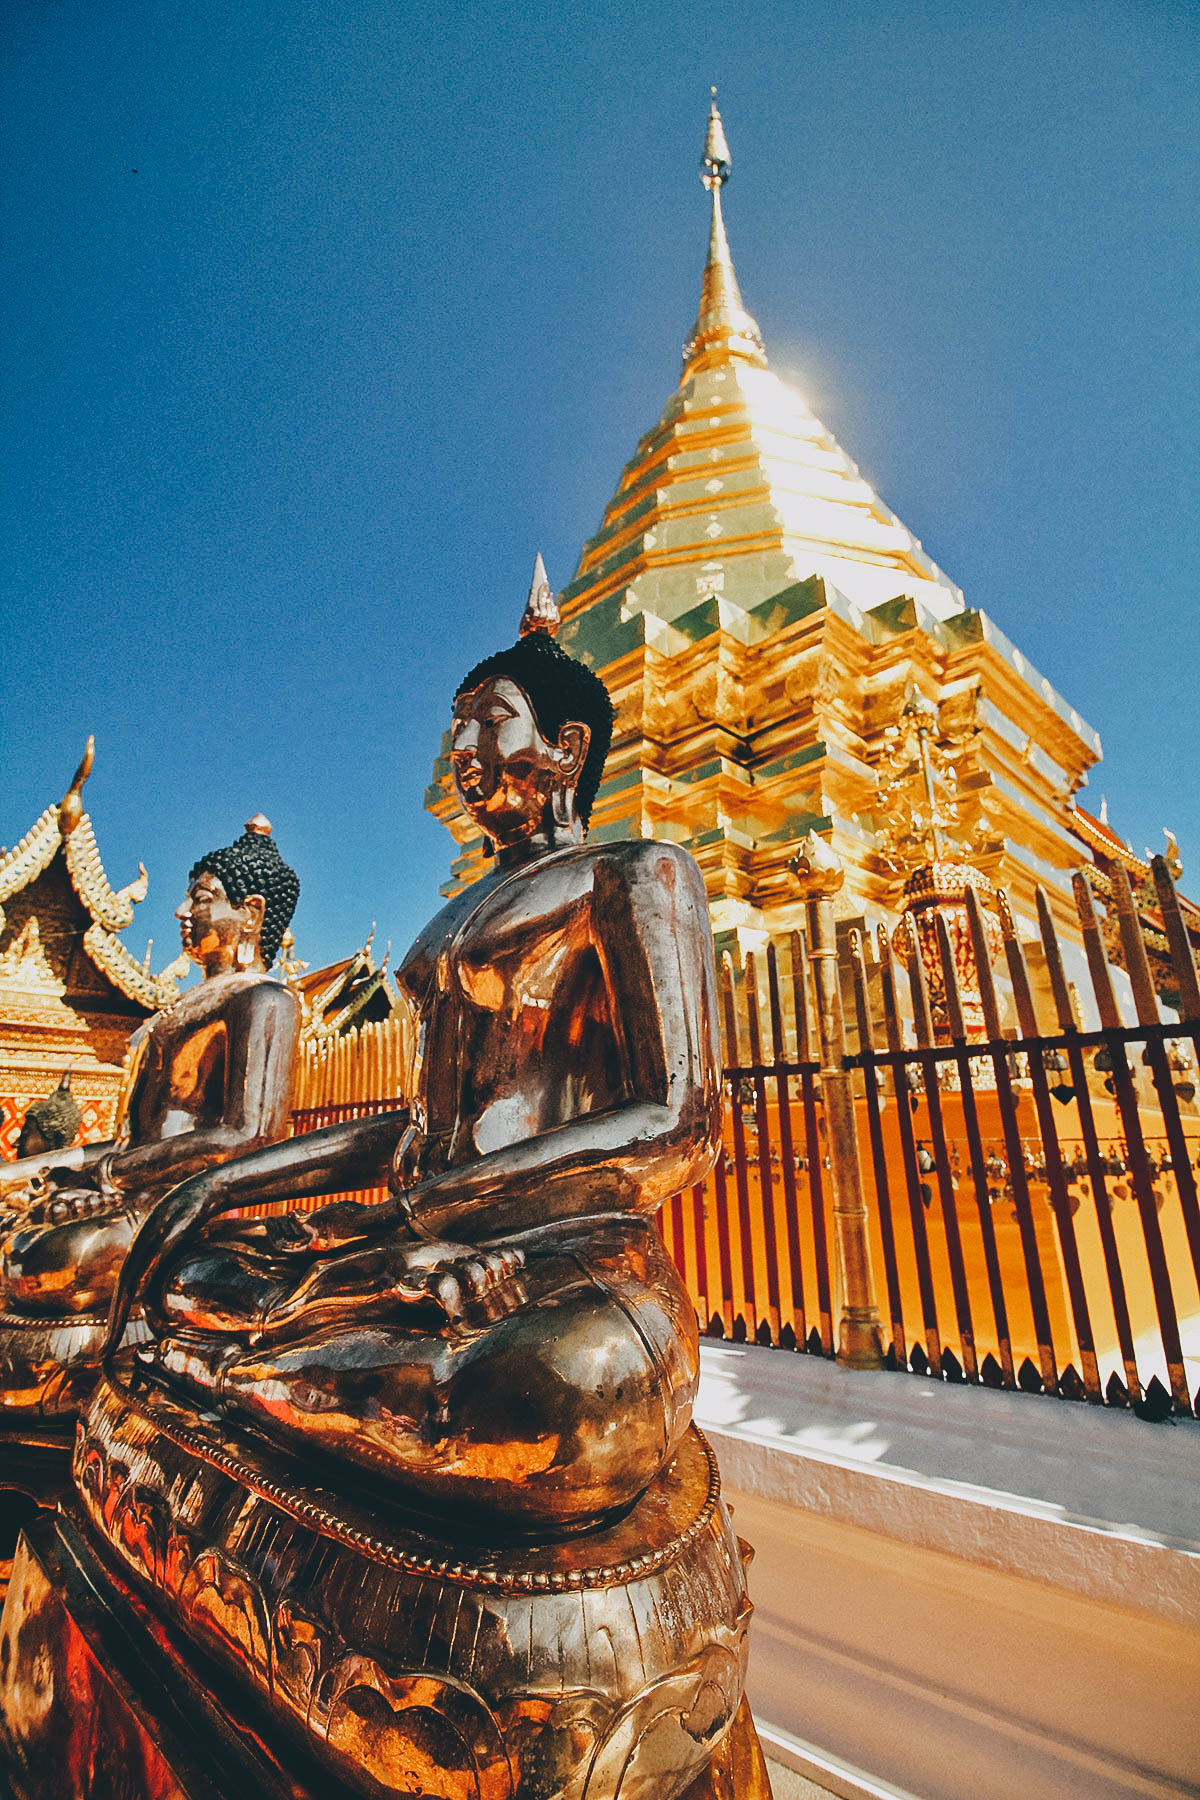 doi-suthep golden Buddha